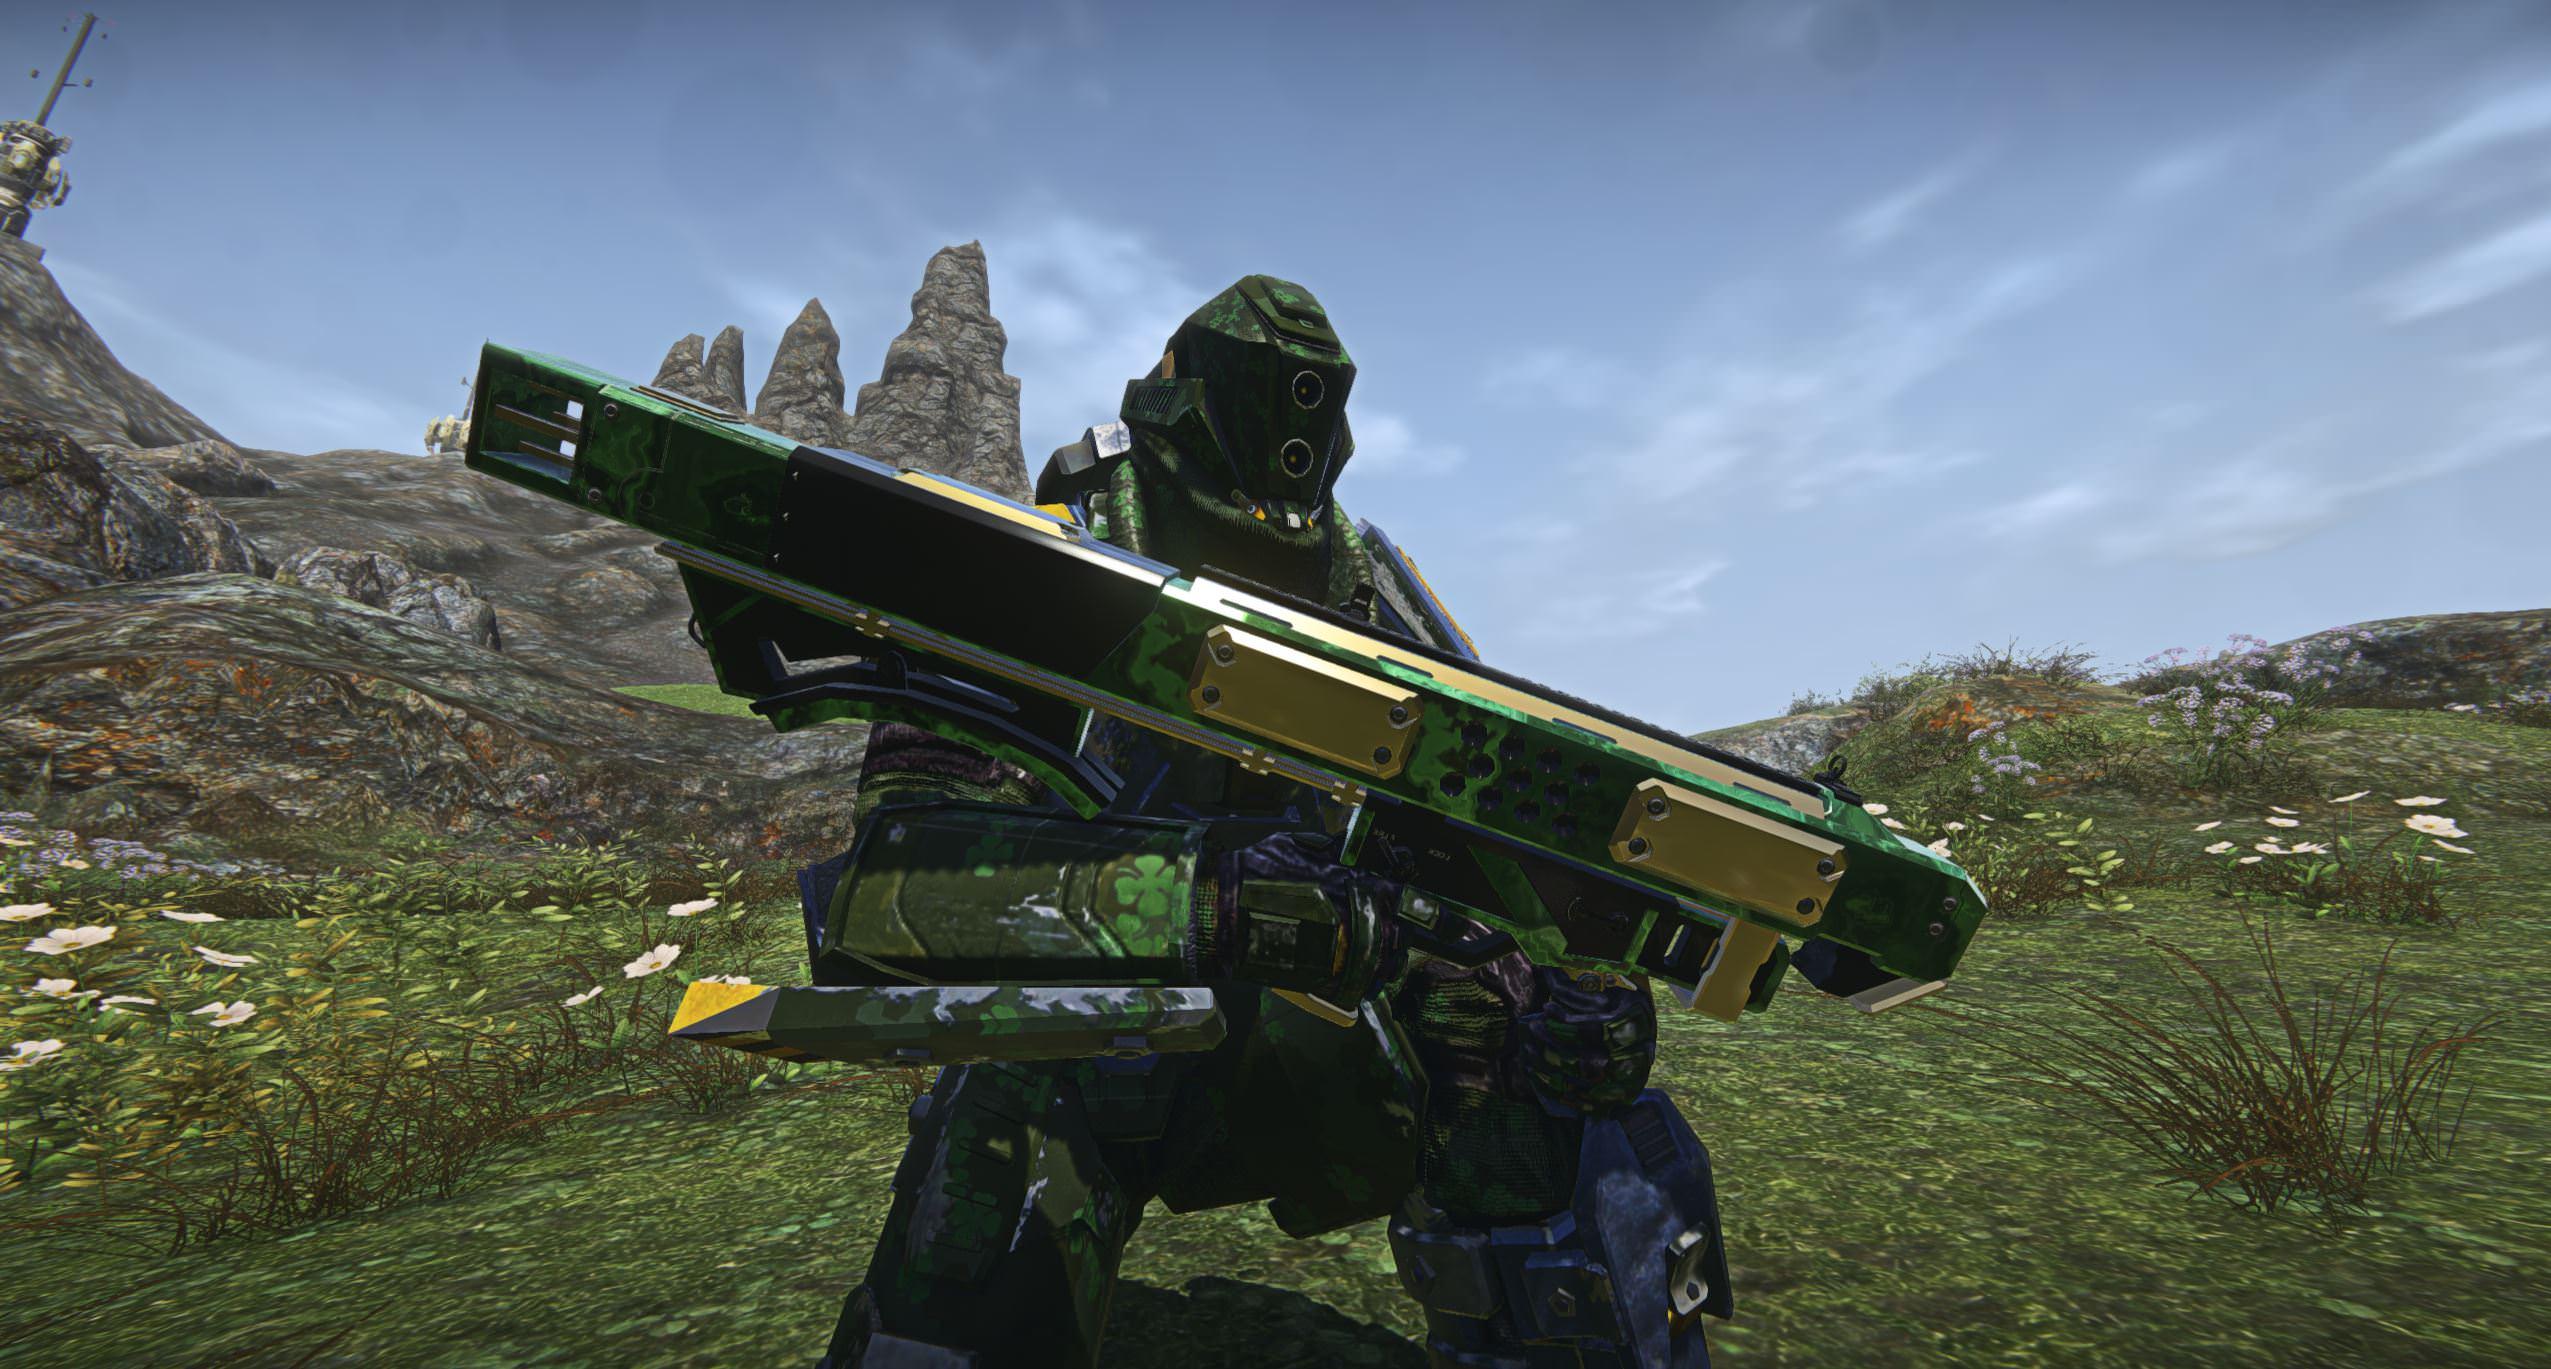 Bloodhit111/Ready to (Sham)Rock the Battlefield?